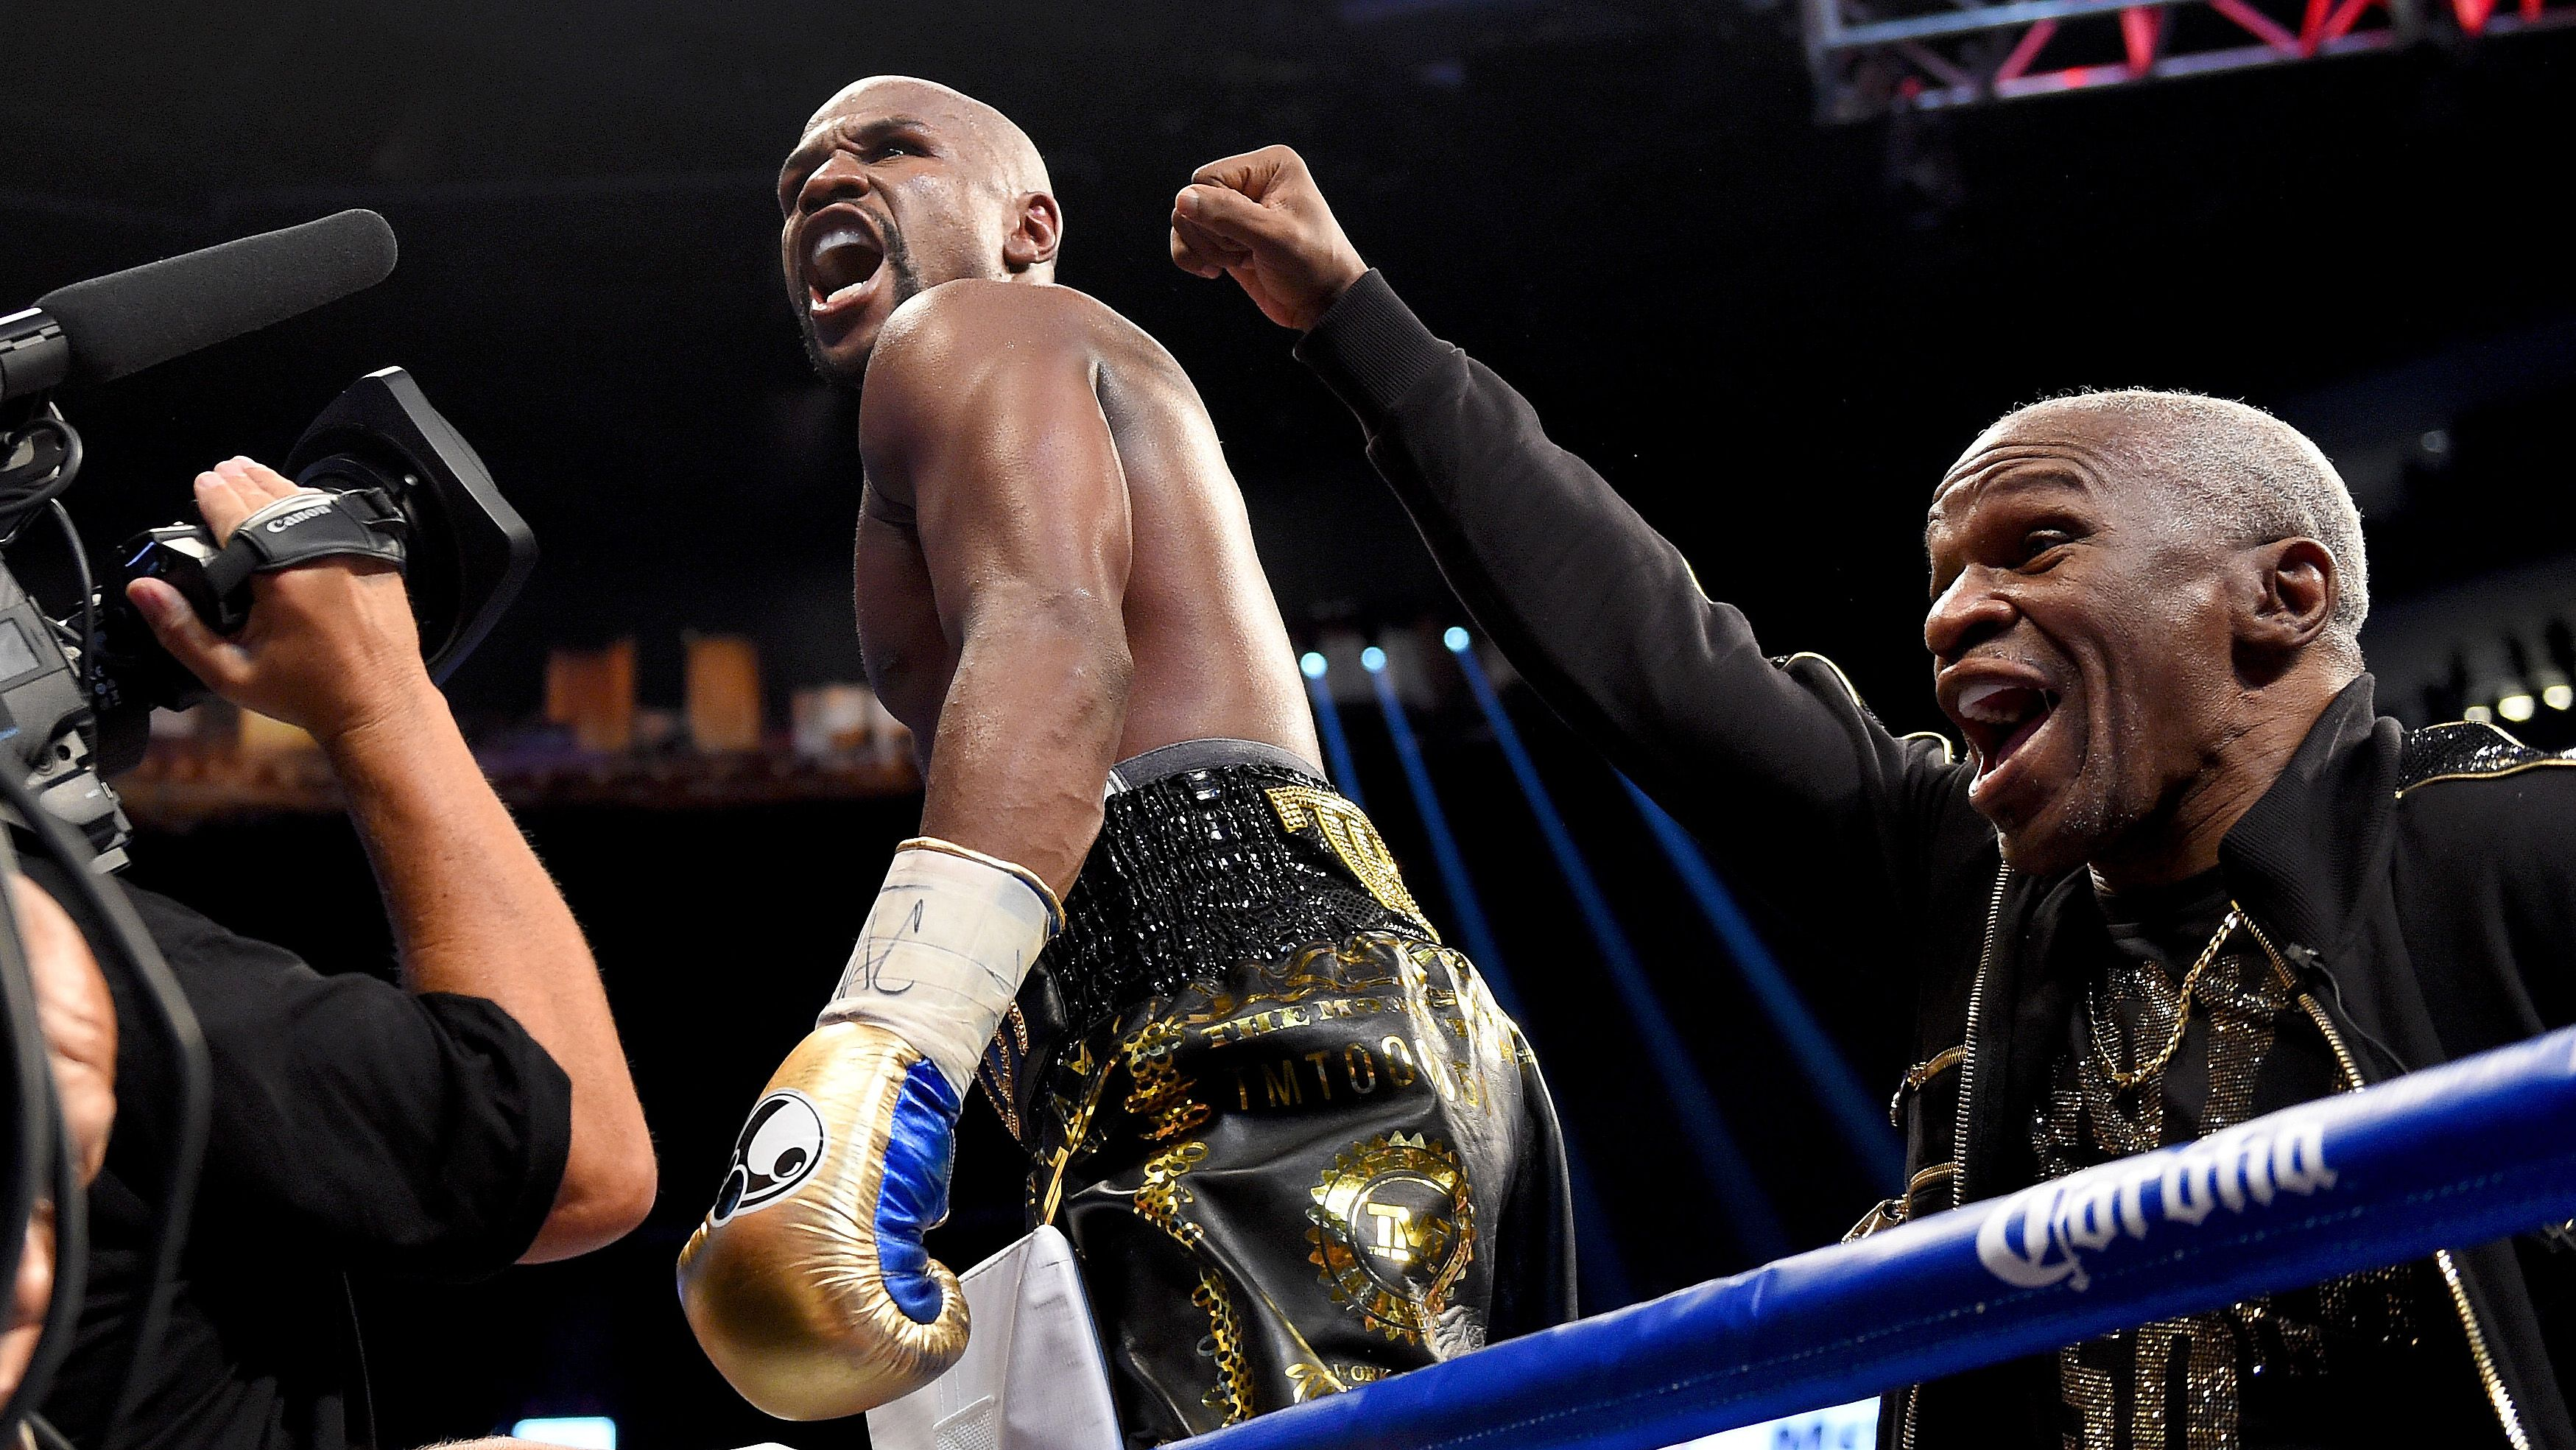 Floyd Mayweather defeats Conor McGregor in 10th round TKO